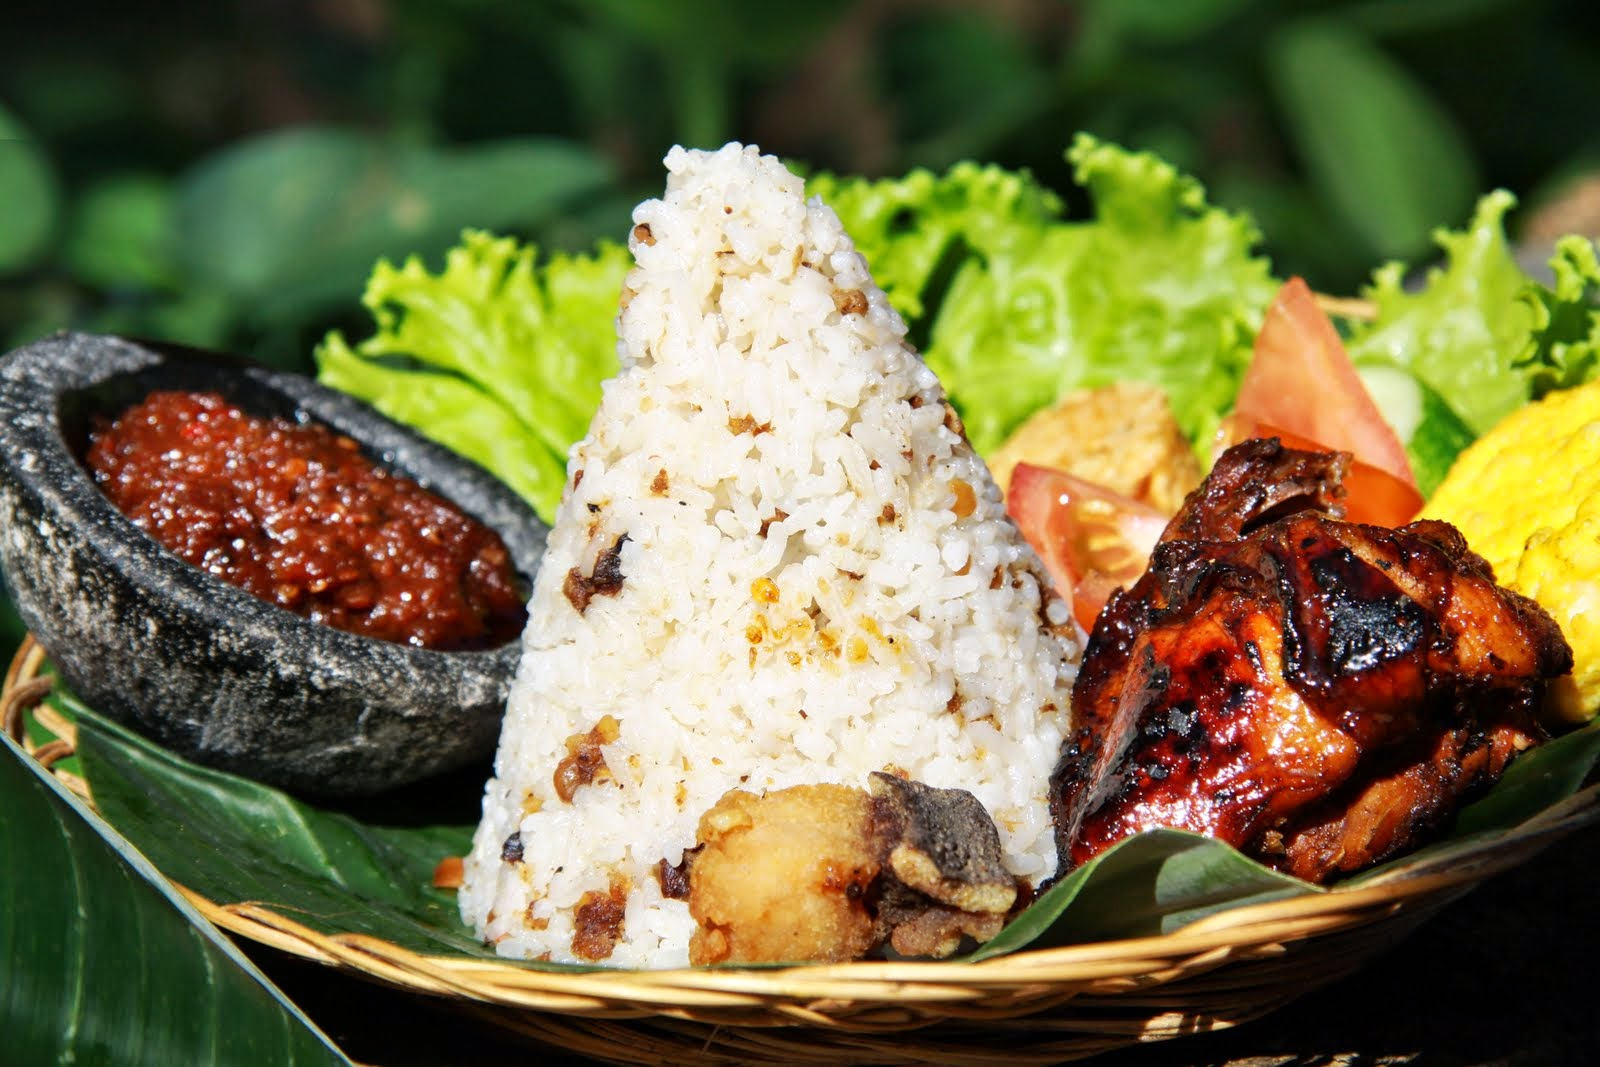 Resep Nasi Liwet Teri khas Sunda Gurih